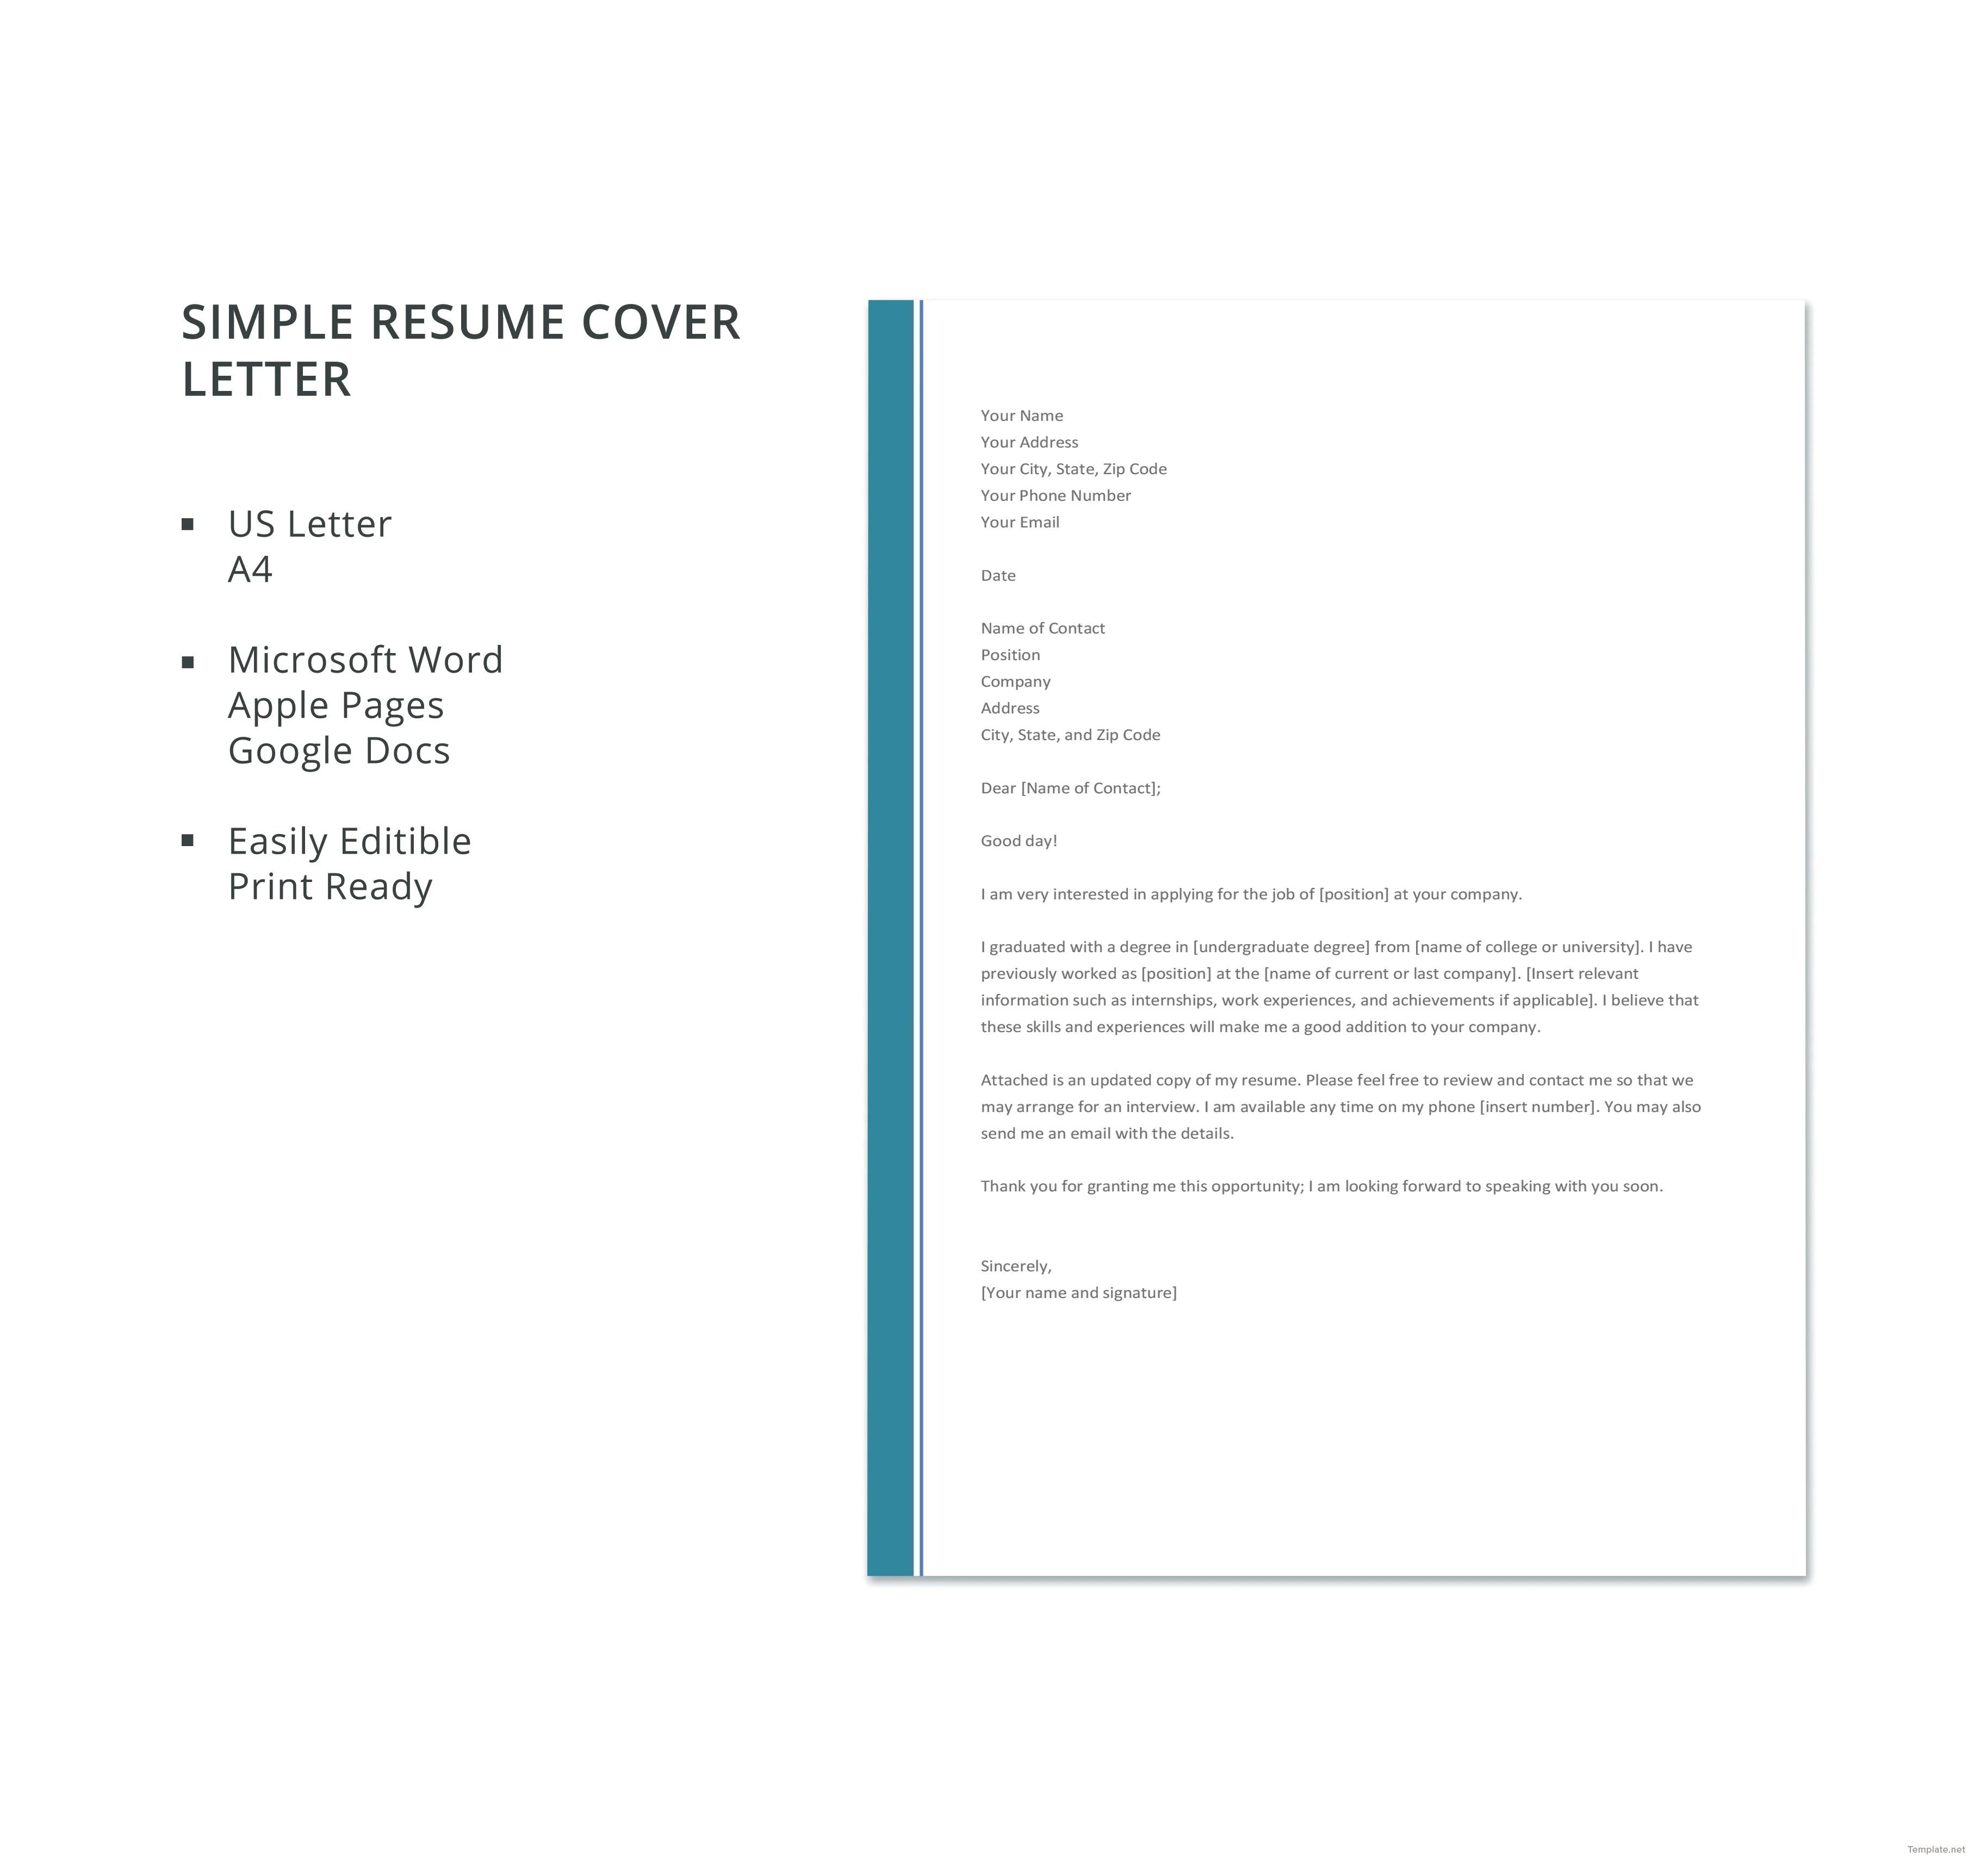 Simple Cover Letter Template Google Docs Lvelegant